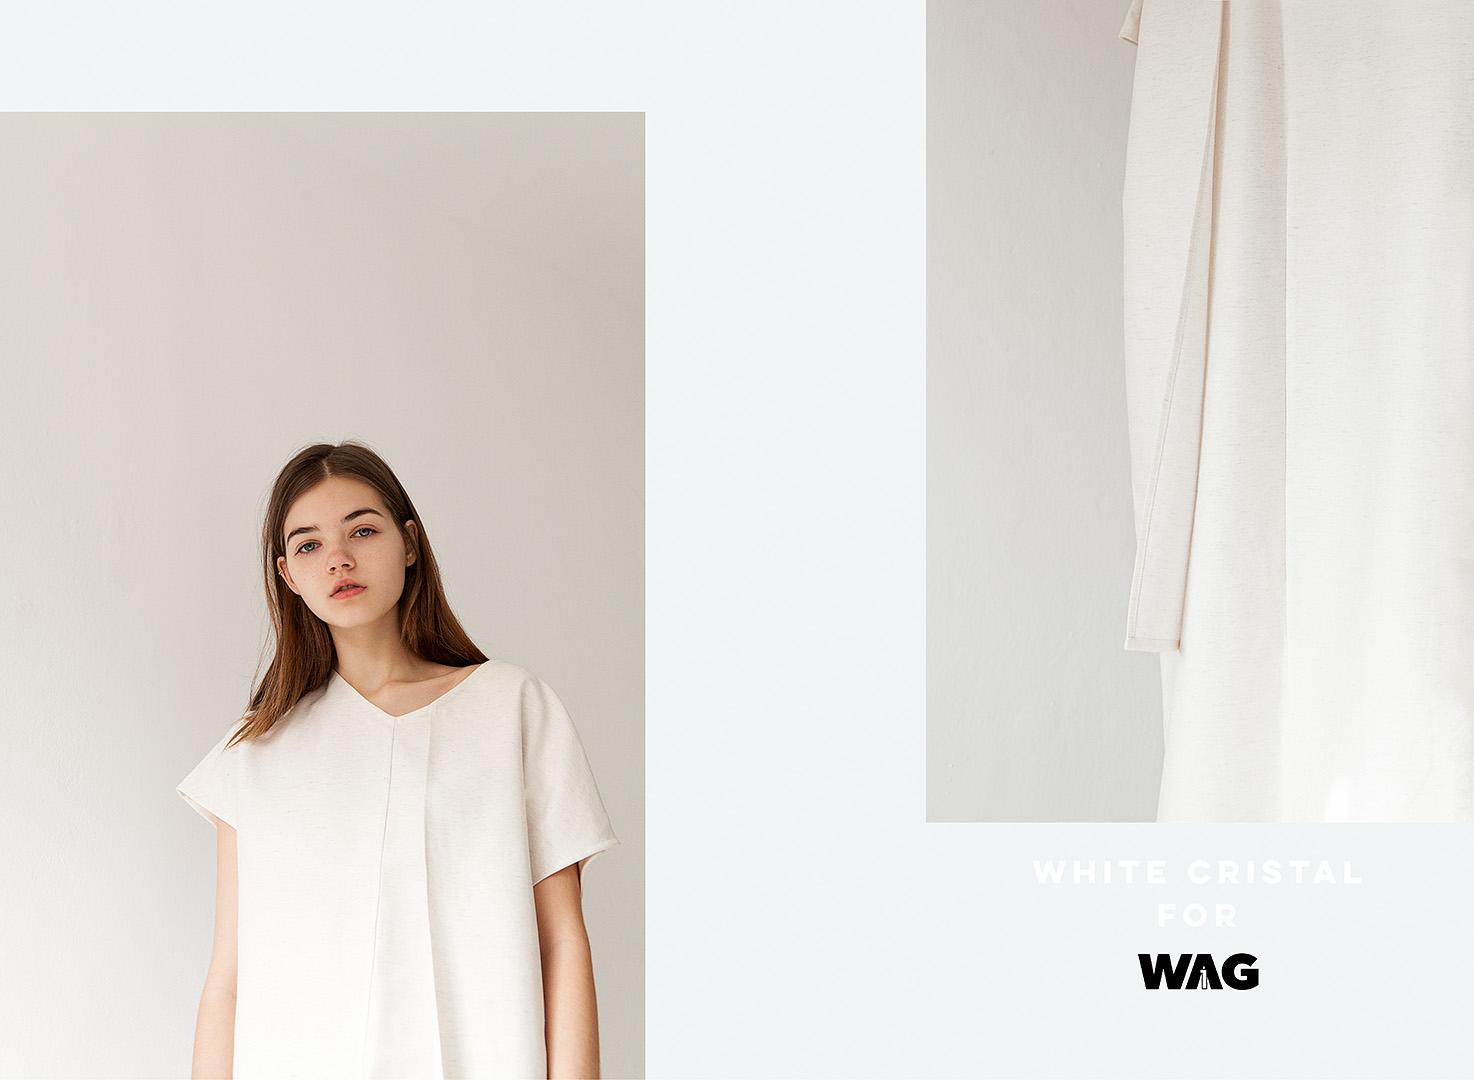 dewerf wag1mag edito 001